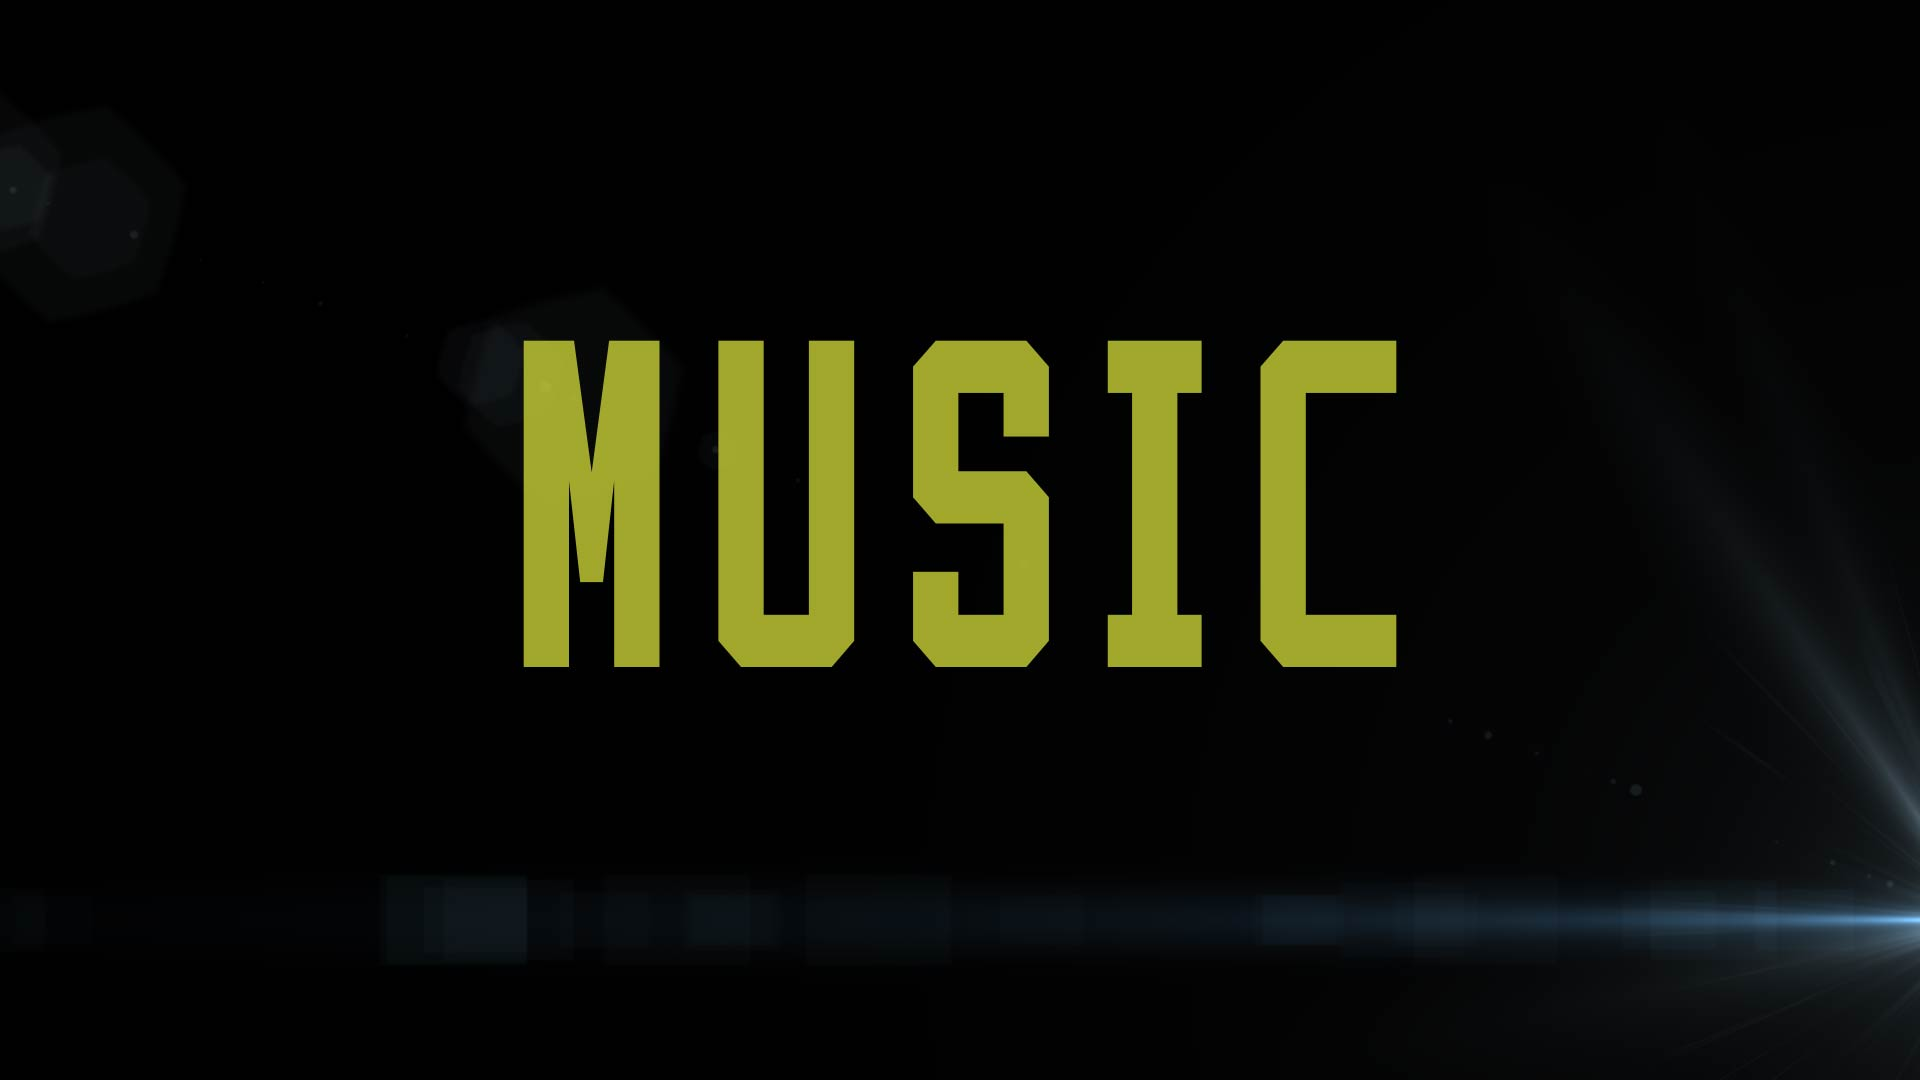 Music - Gallery Breaker_00000_00000.jpg